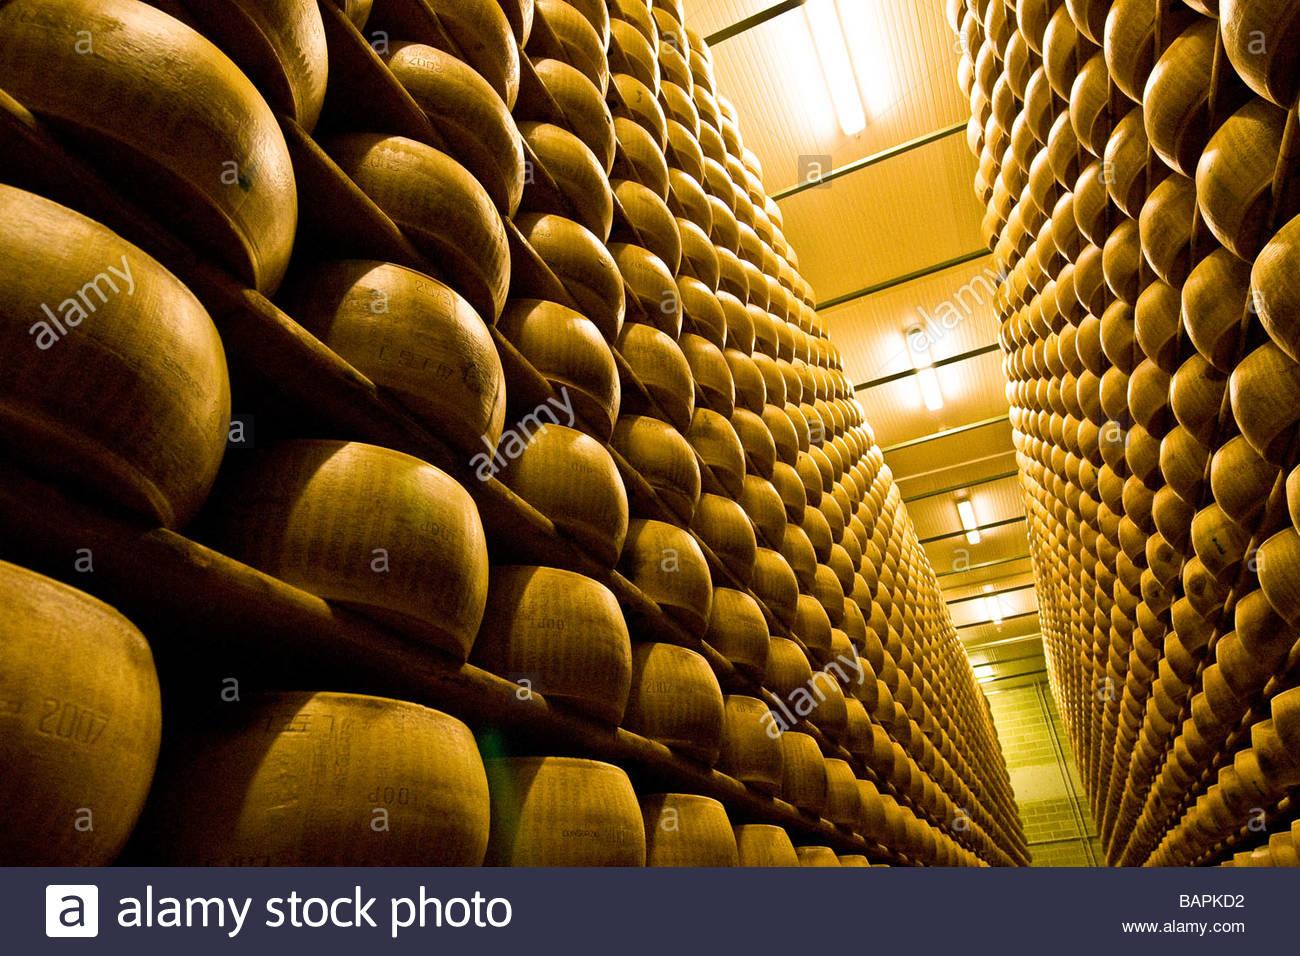 parmigiano reggiano  cooperativa casearia castelnovese  castelnuovo rangone  emilia romagna  italy Stock Photo